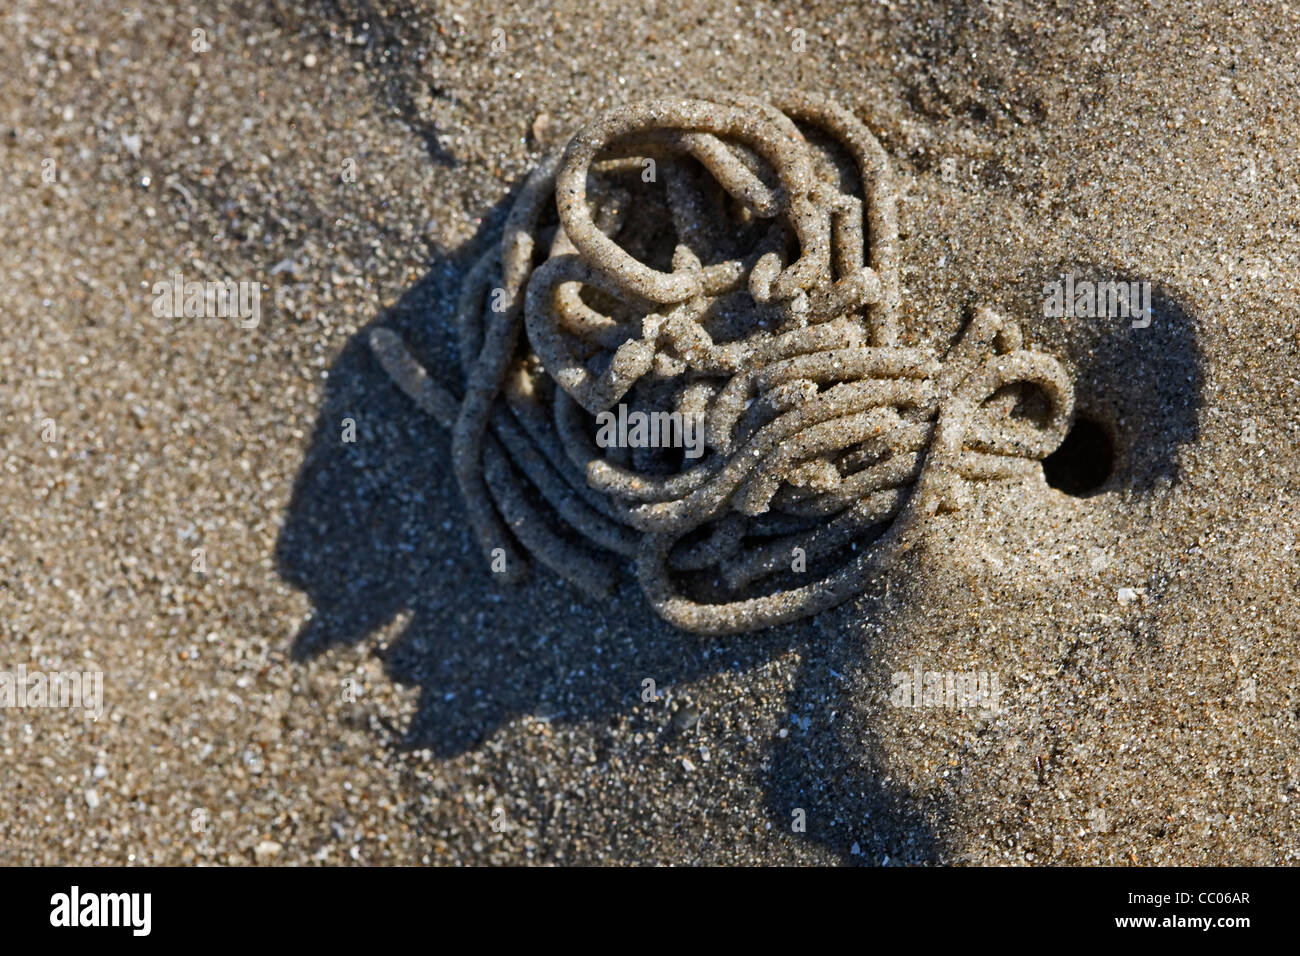 European Lugworm (Arenicola marina) cast of defaecated sediment on beach at low tide, North Sea, Belgium - Stock Image